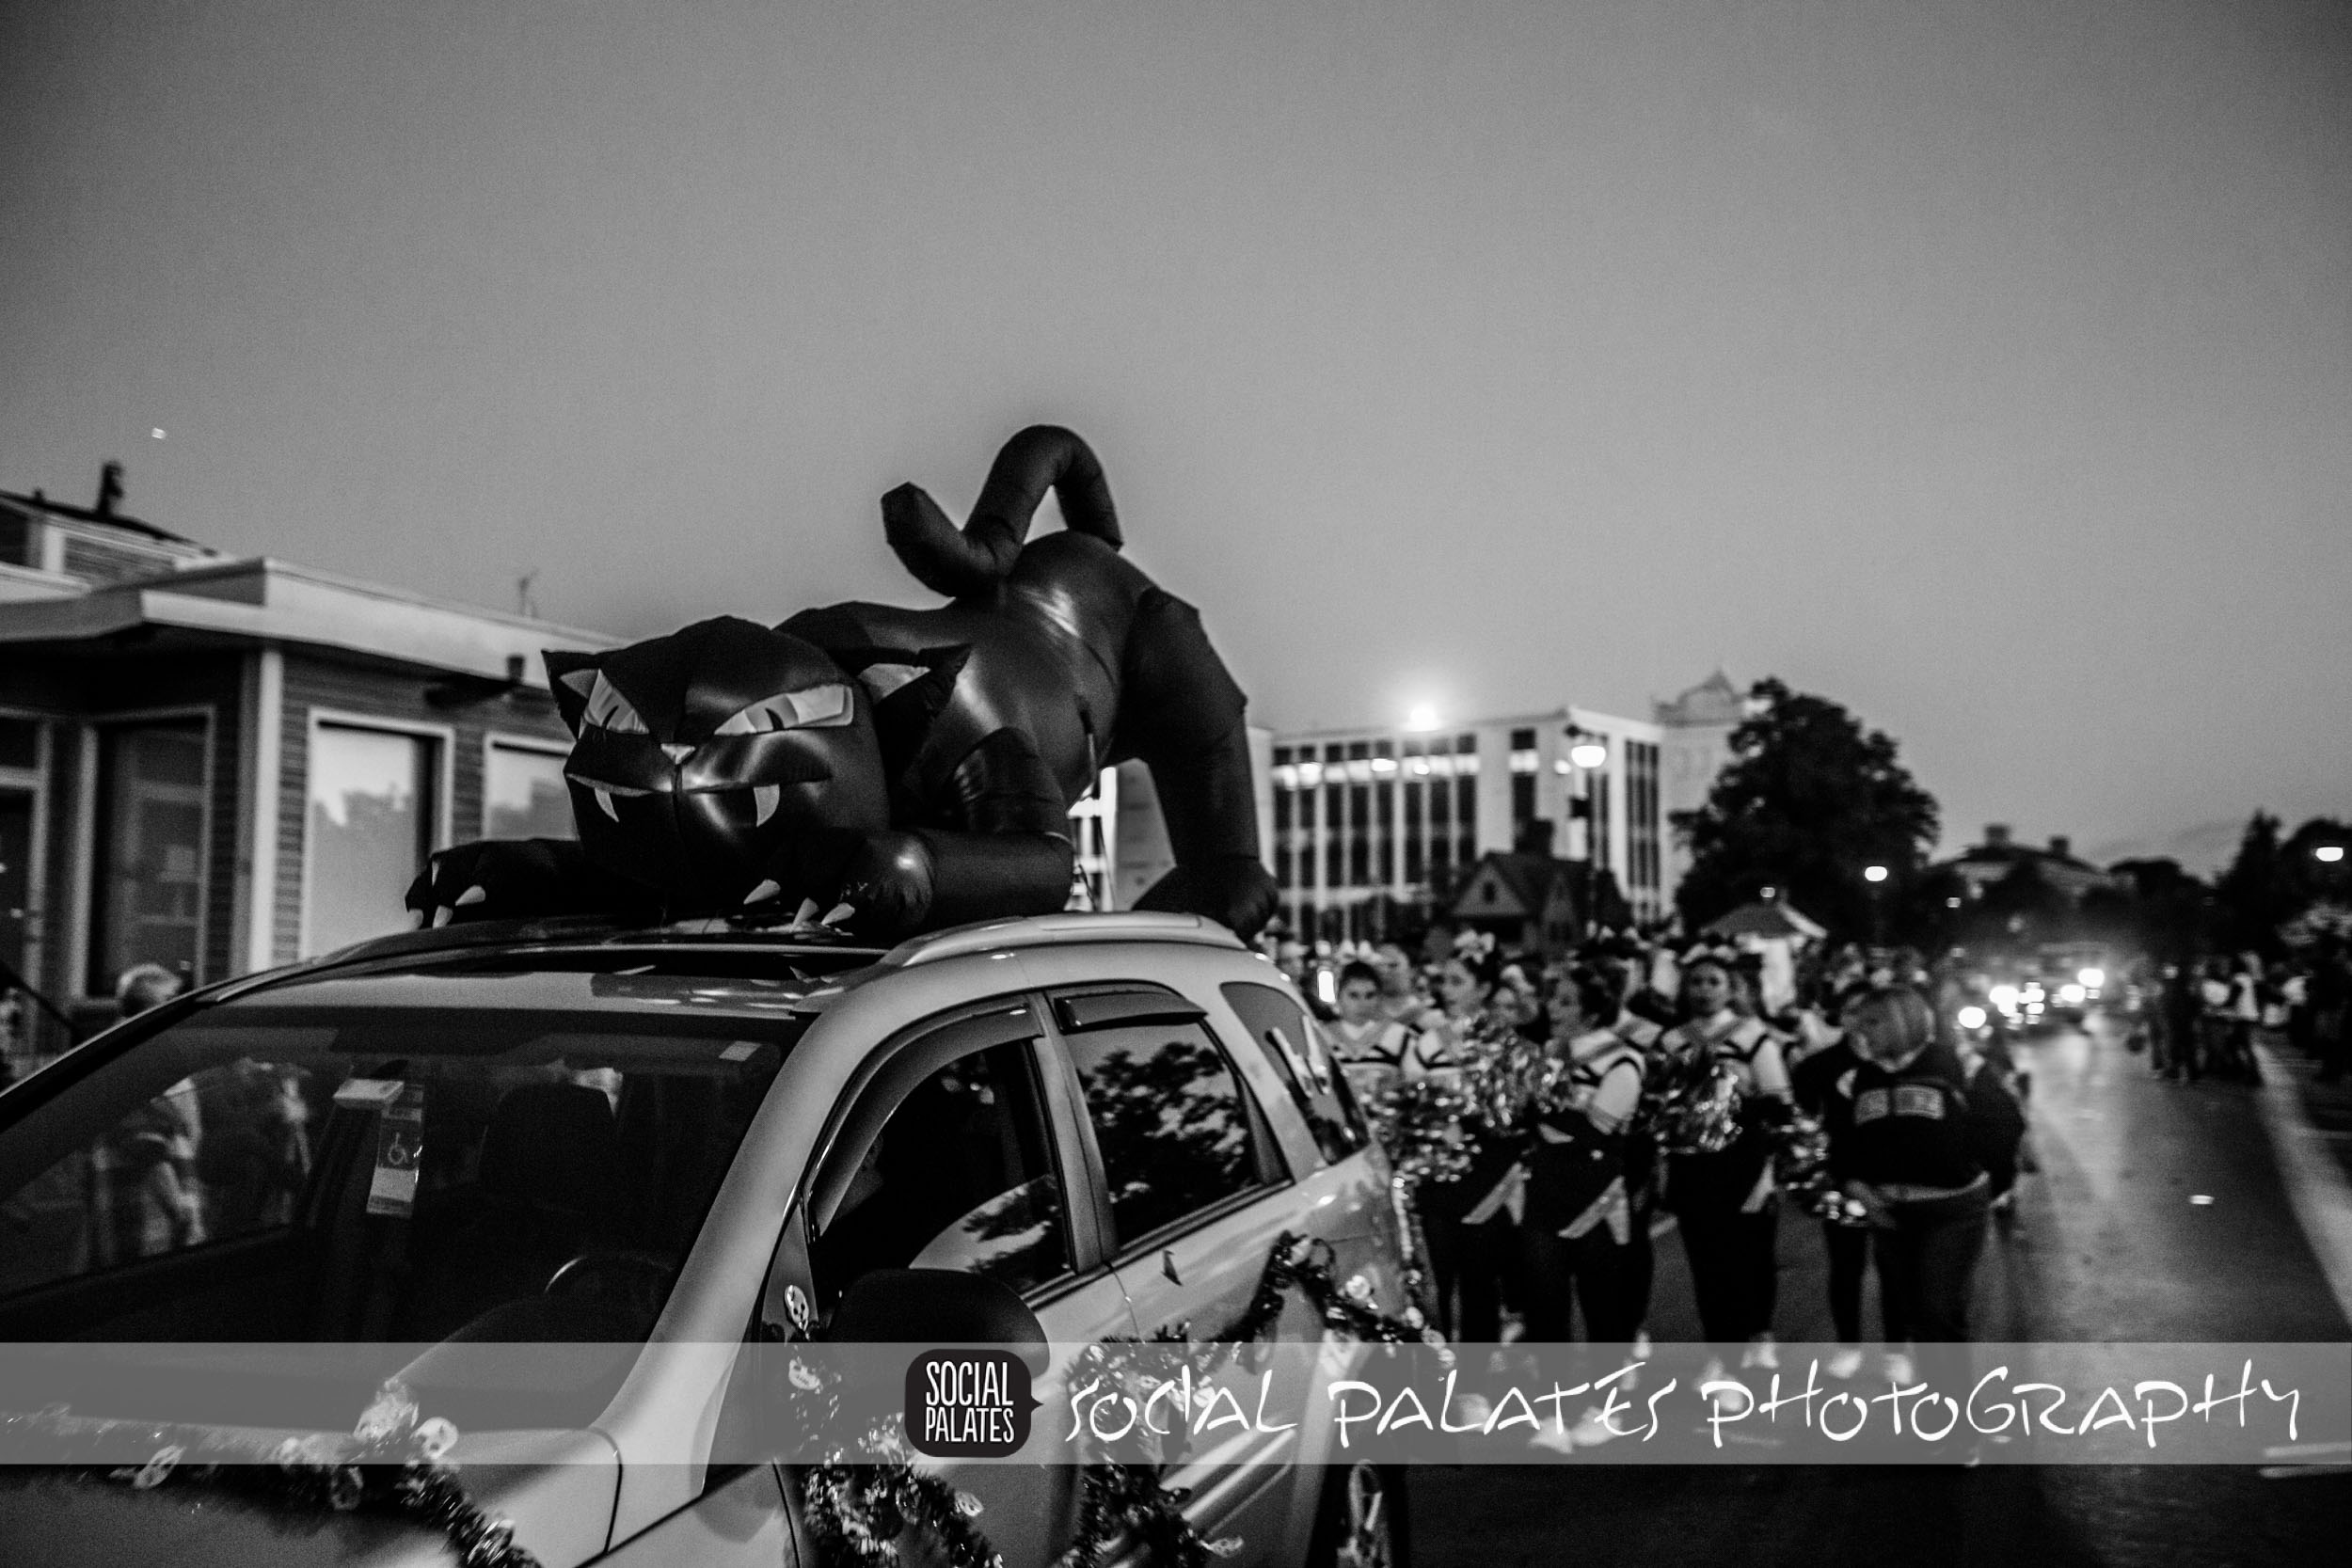 Haunted Happenings Parade 2014 Creative Salem by Social Palates-7453.jpg